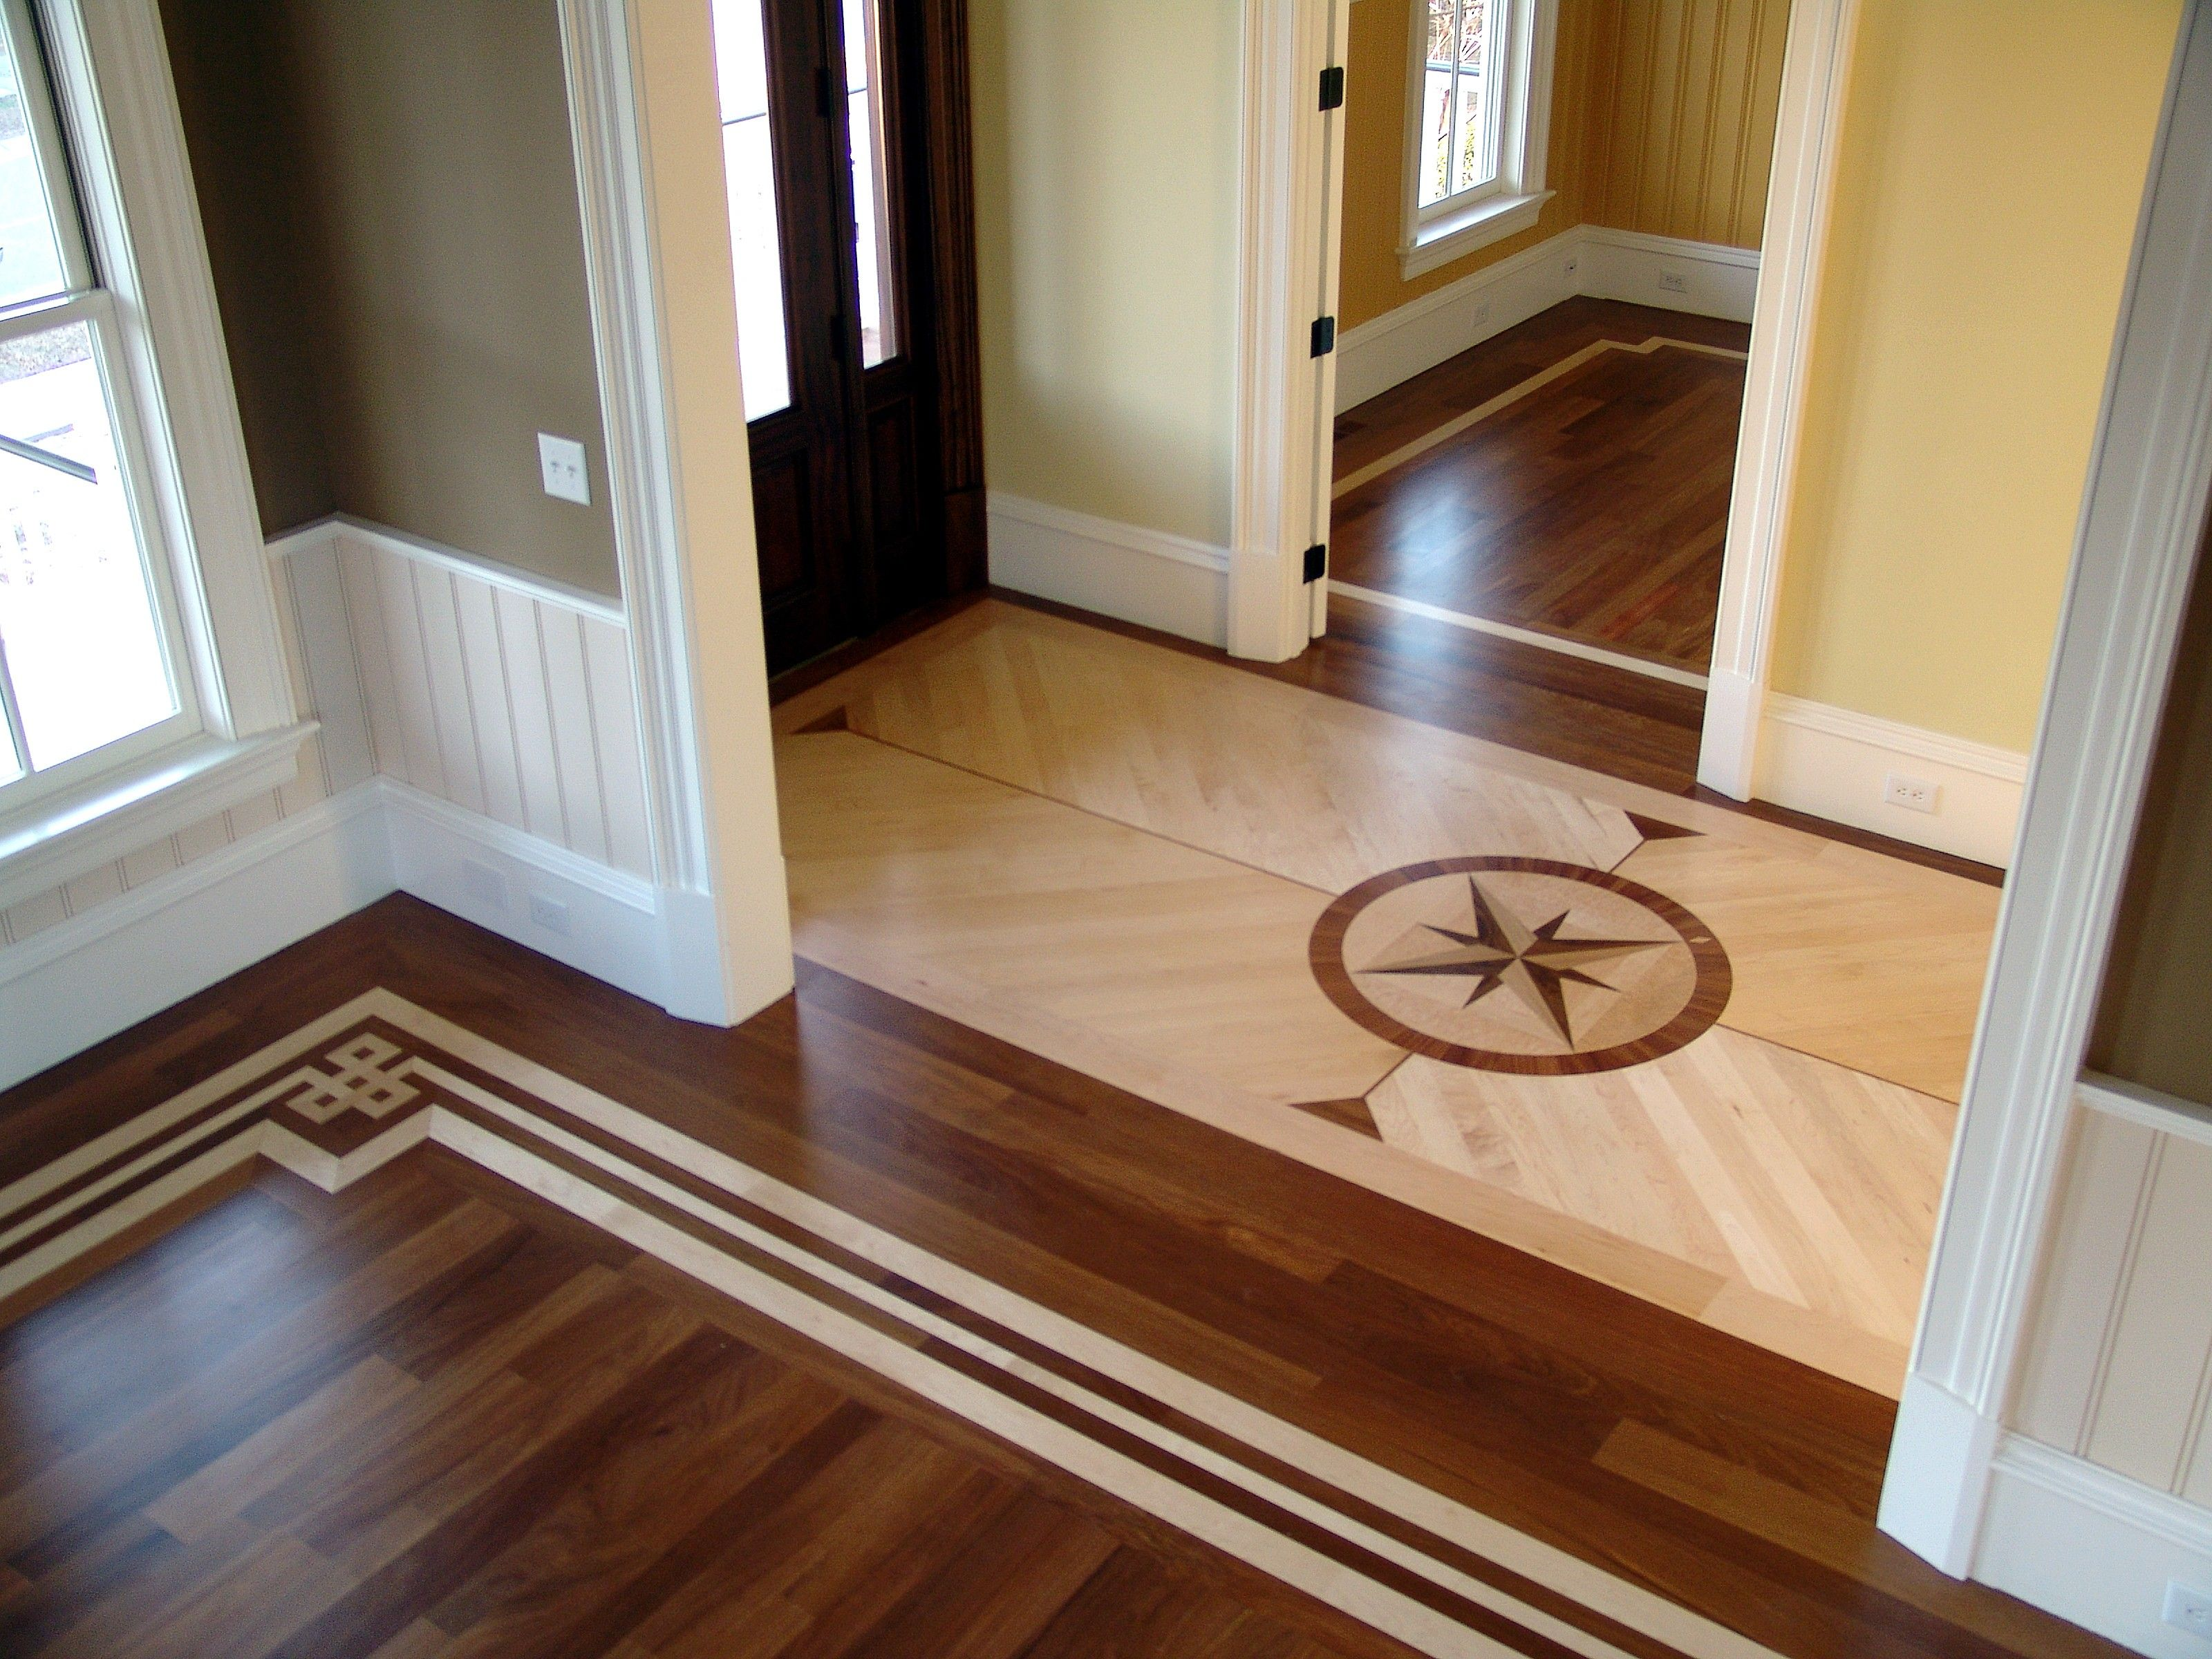 1000+ images about Hardwood flooring on Pinterest - ^